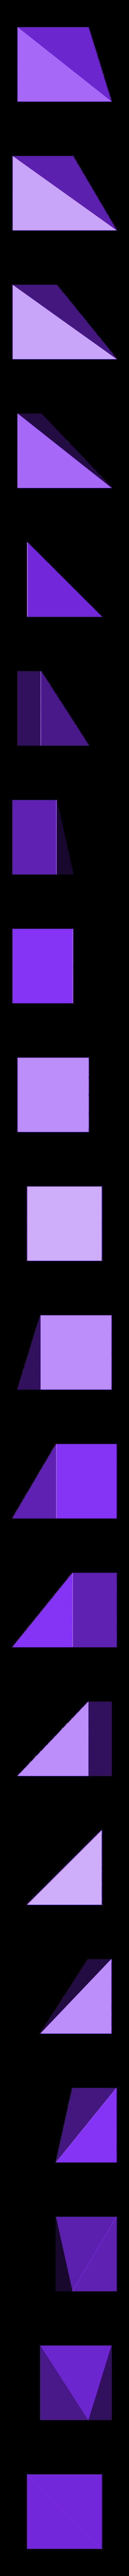 LiuHuiThird_VerA.stl Download free STL file Thirds Cube Dissection, Many Styles, Liu Hui • 3D printer template, LGBU